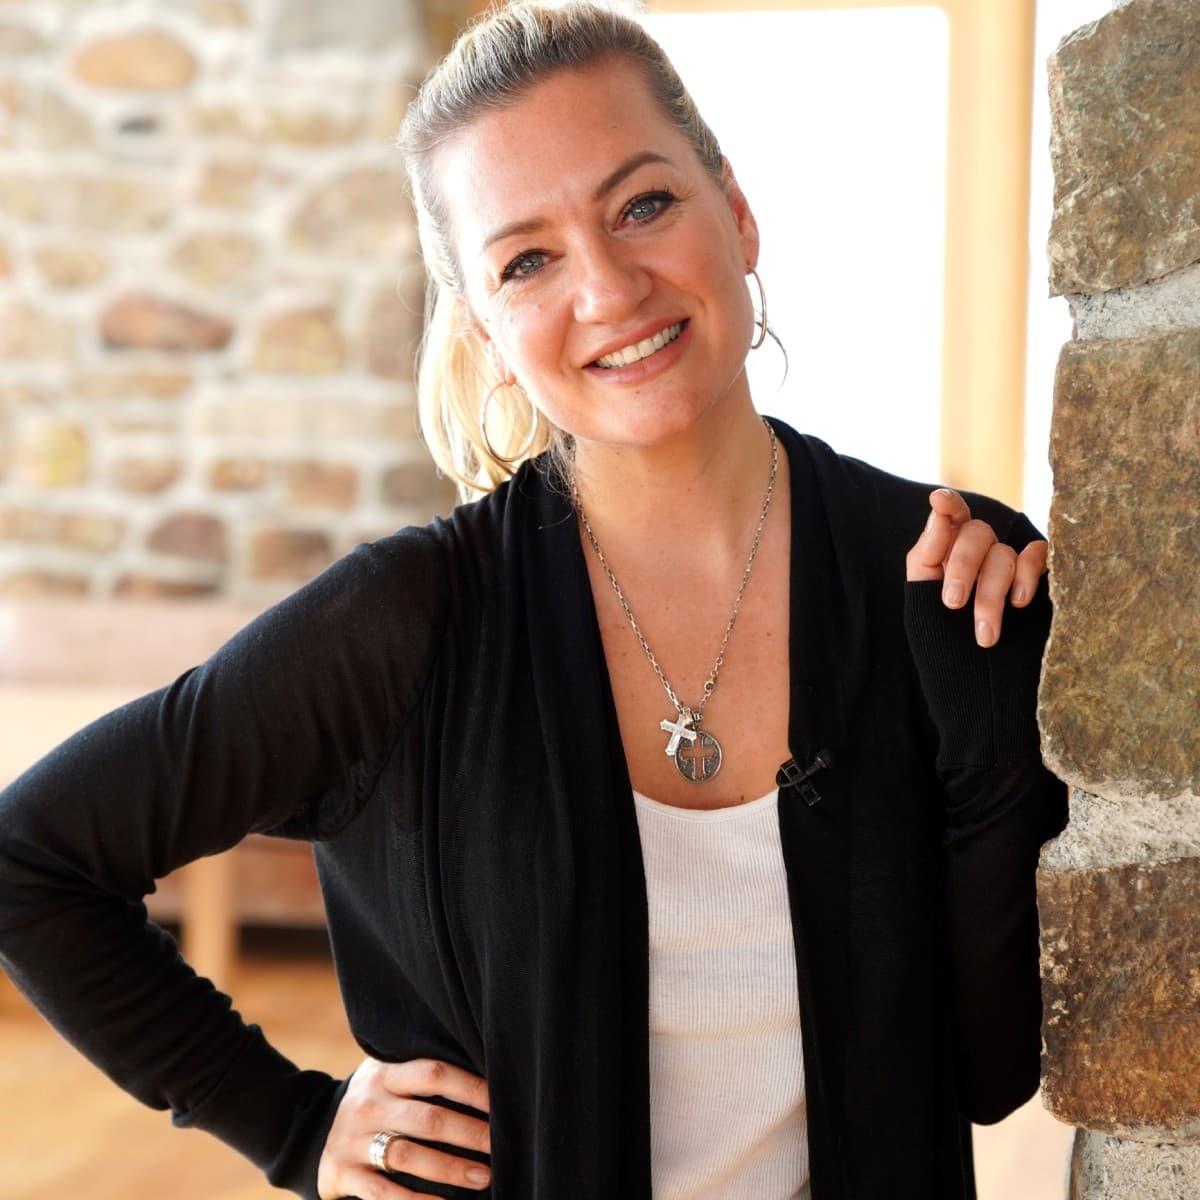 Juliette Schoppmann bei DSDS 2019 als Vocal-Coach dabei